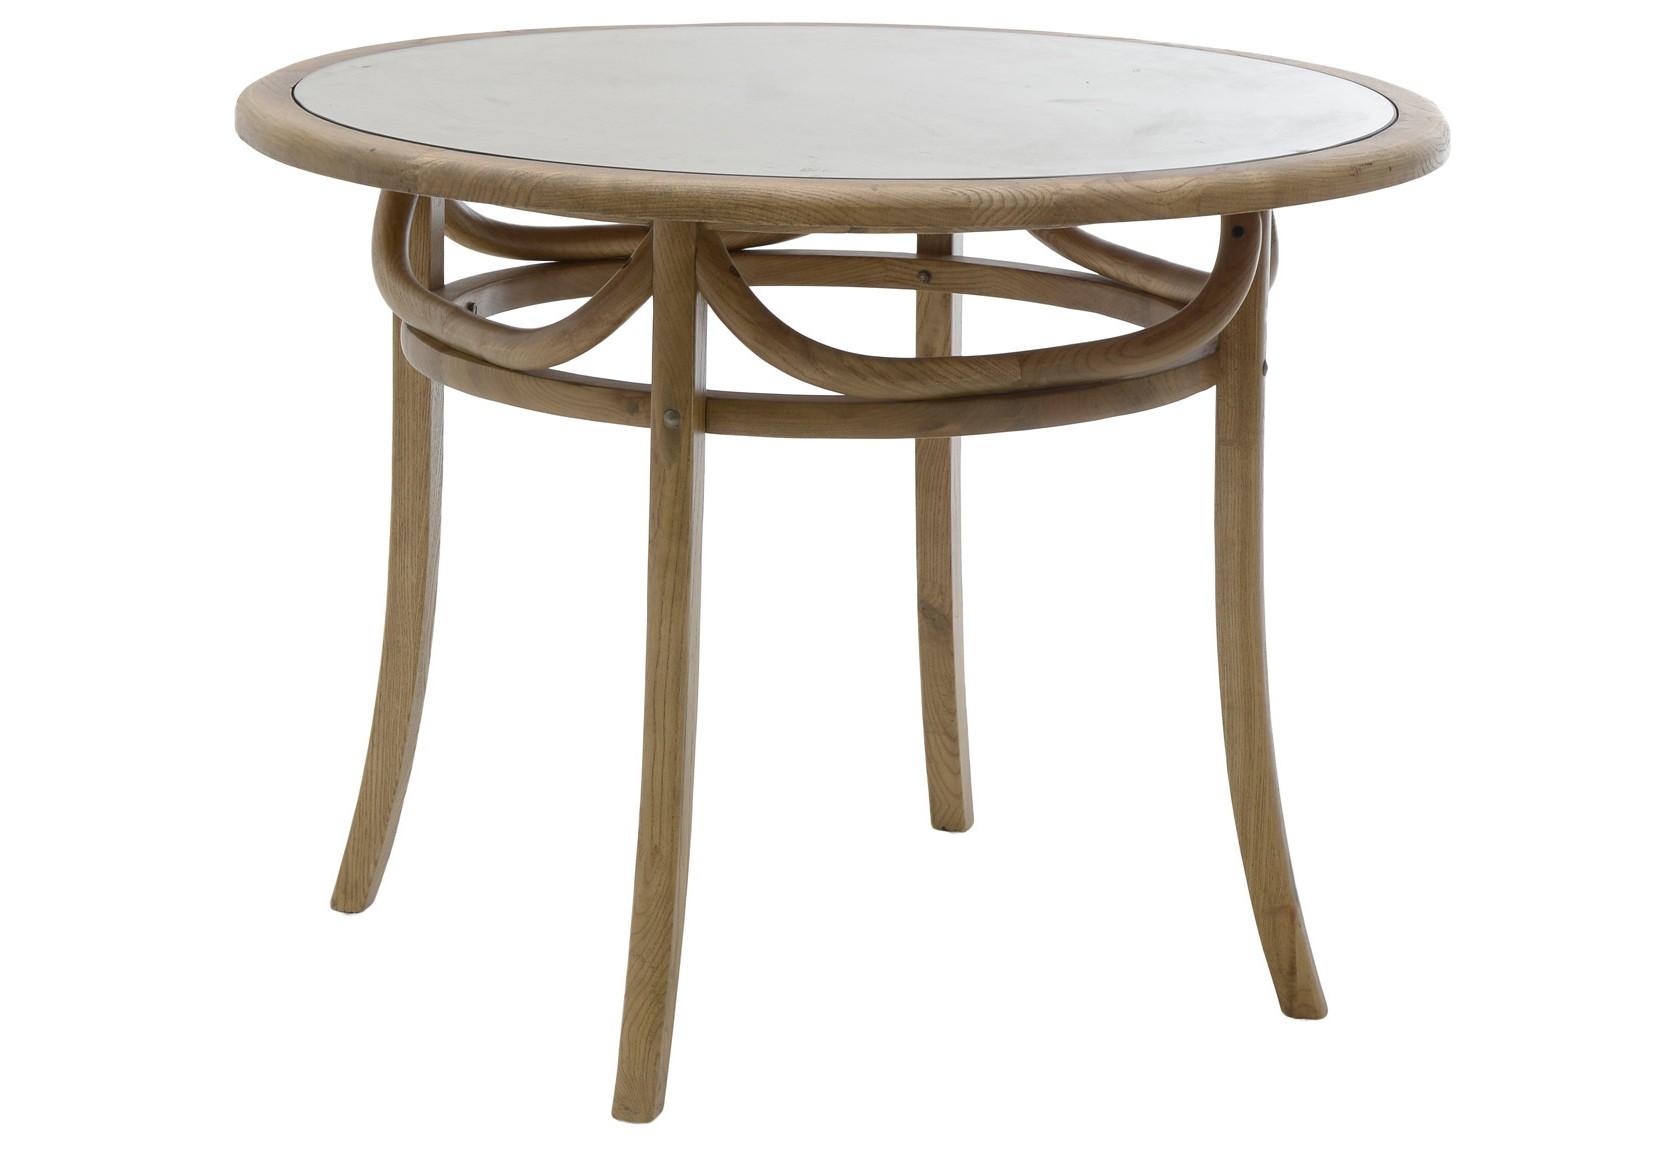 Кухонный стол To4rooms 15441196 от thefurnish